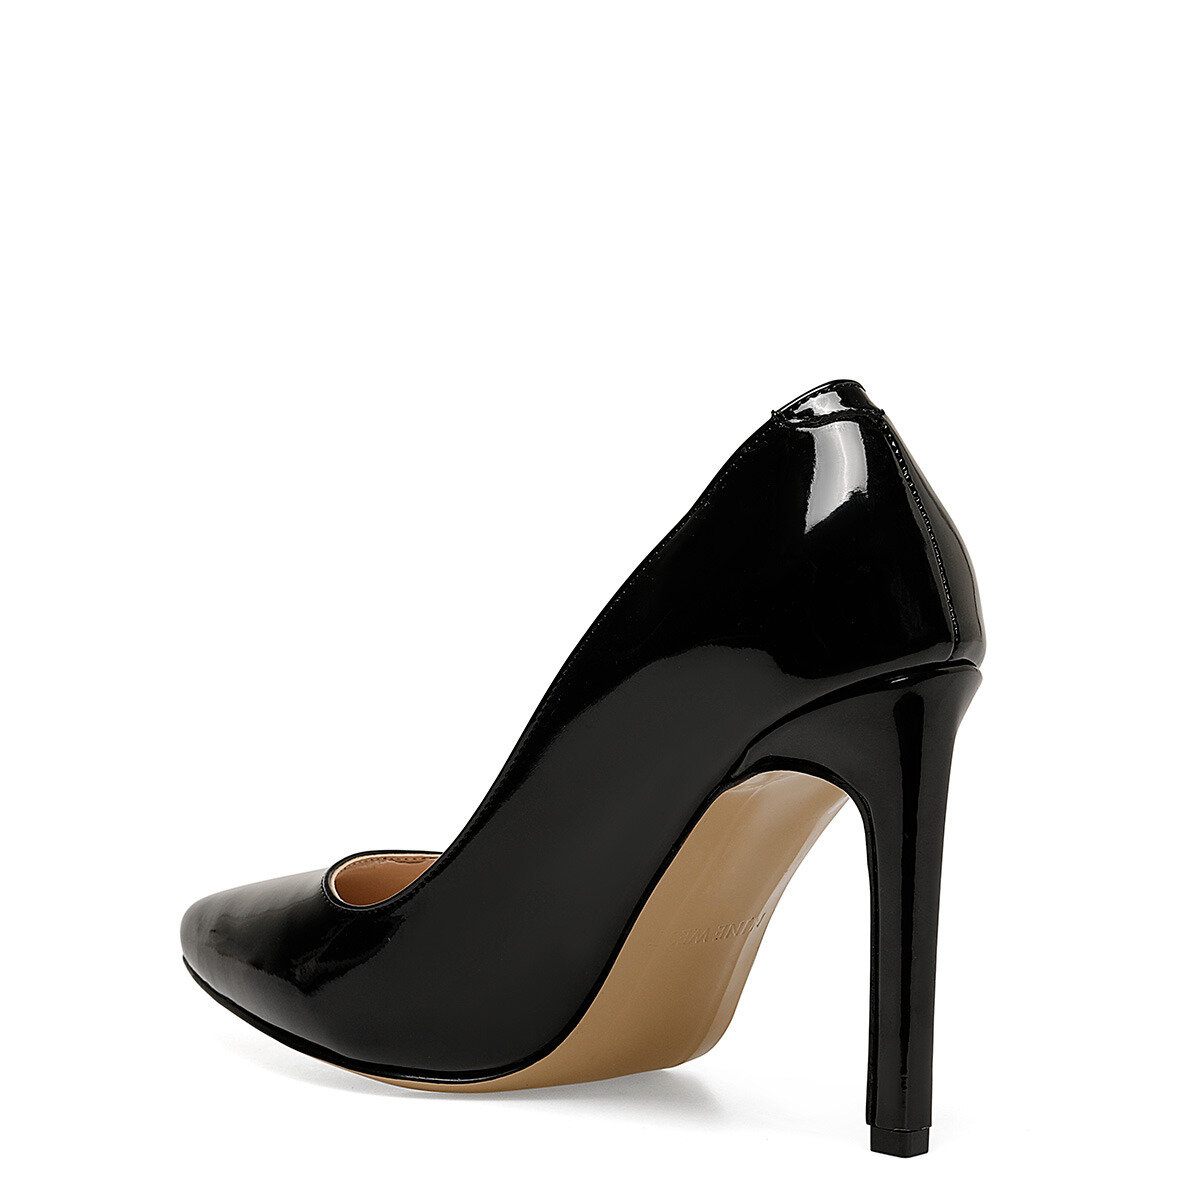 RAINA3 Siyah Kadın Stiletto